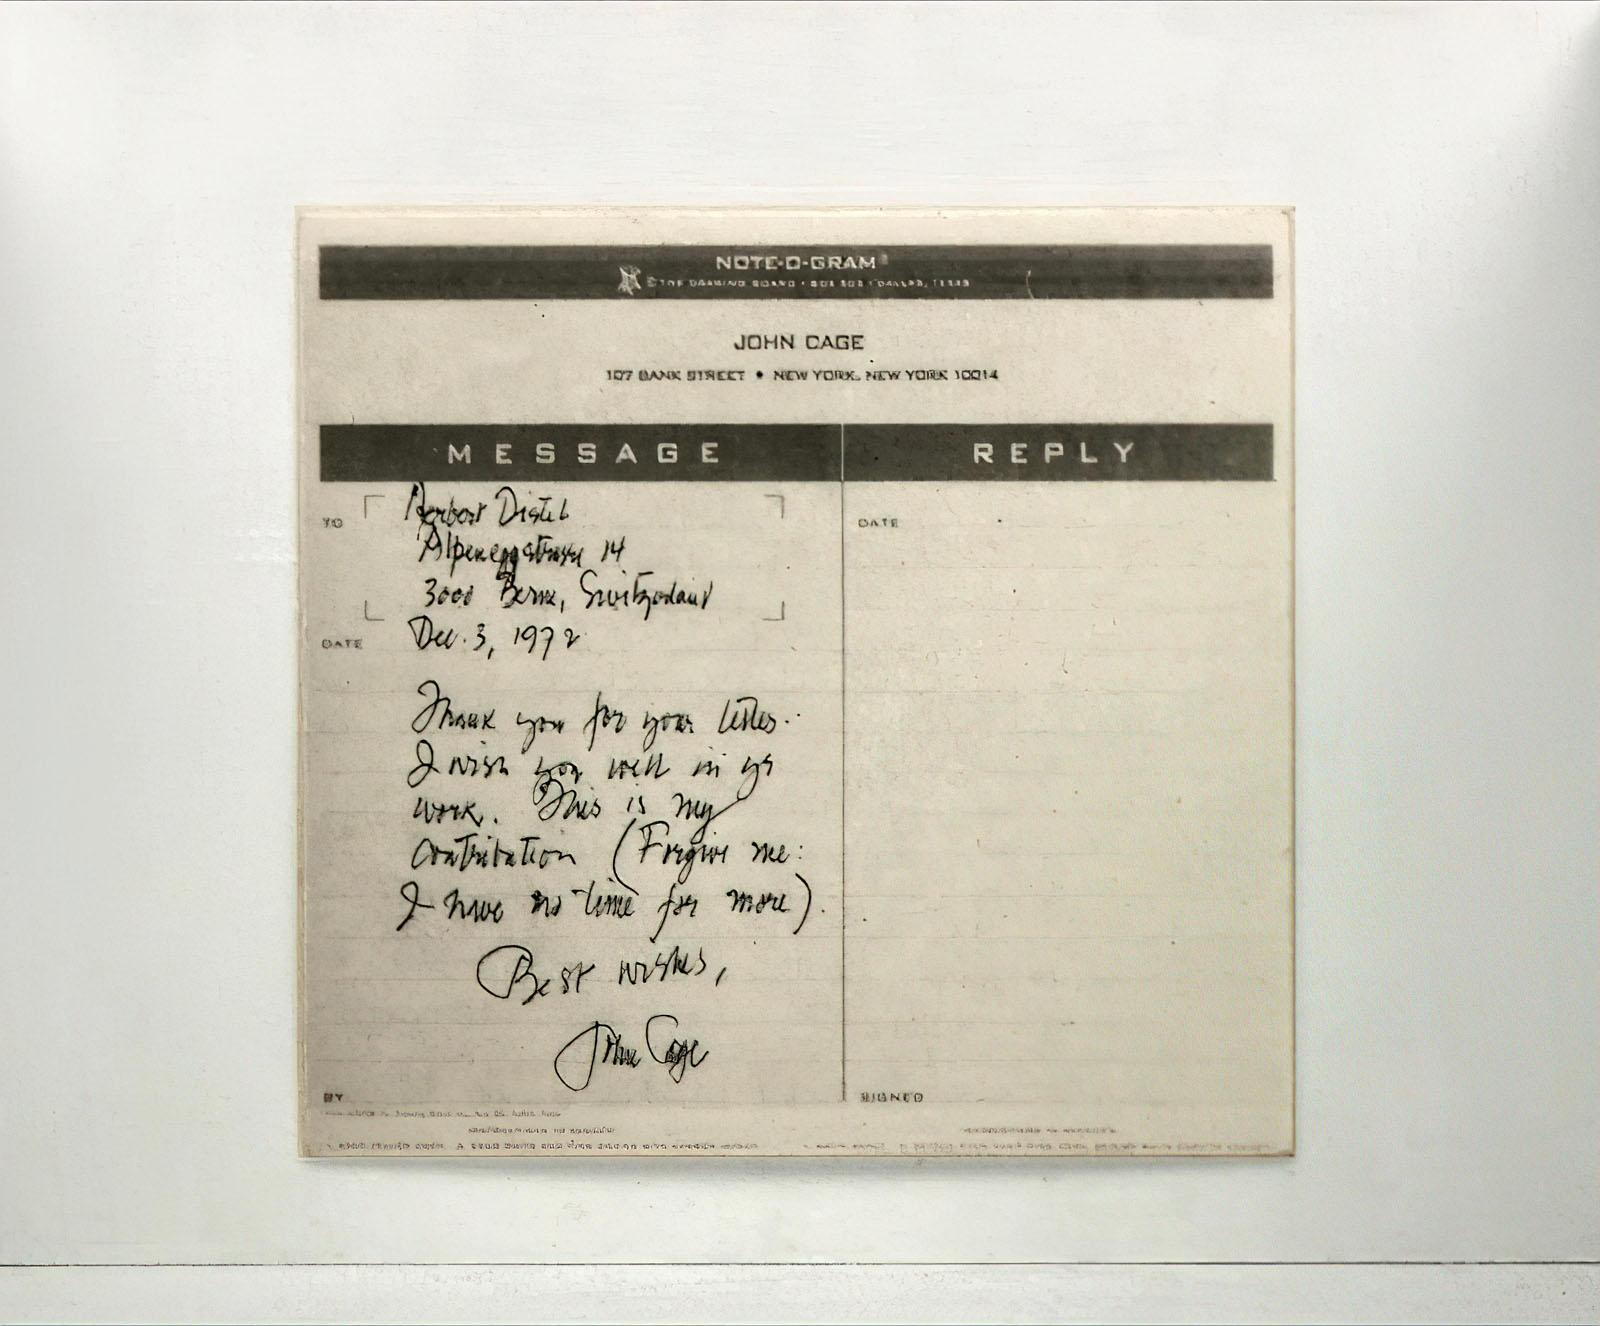 John Cage - Untitled